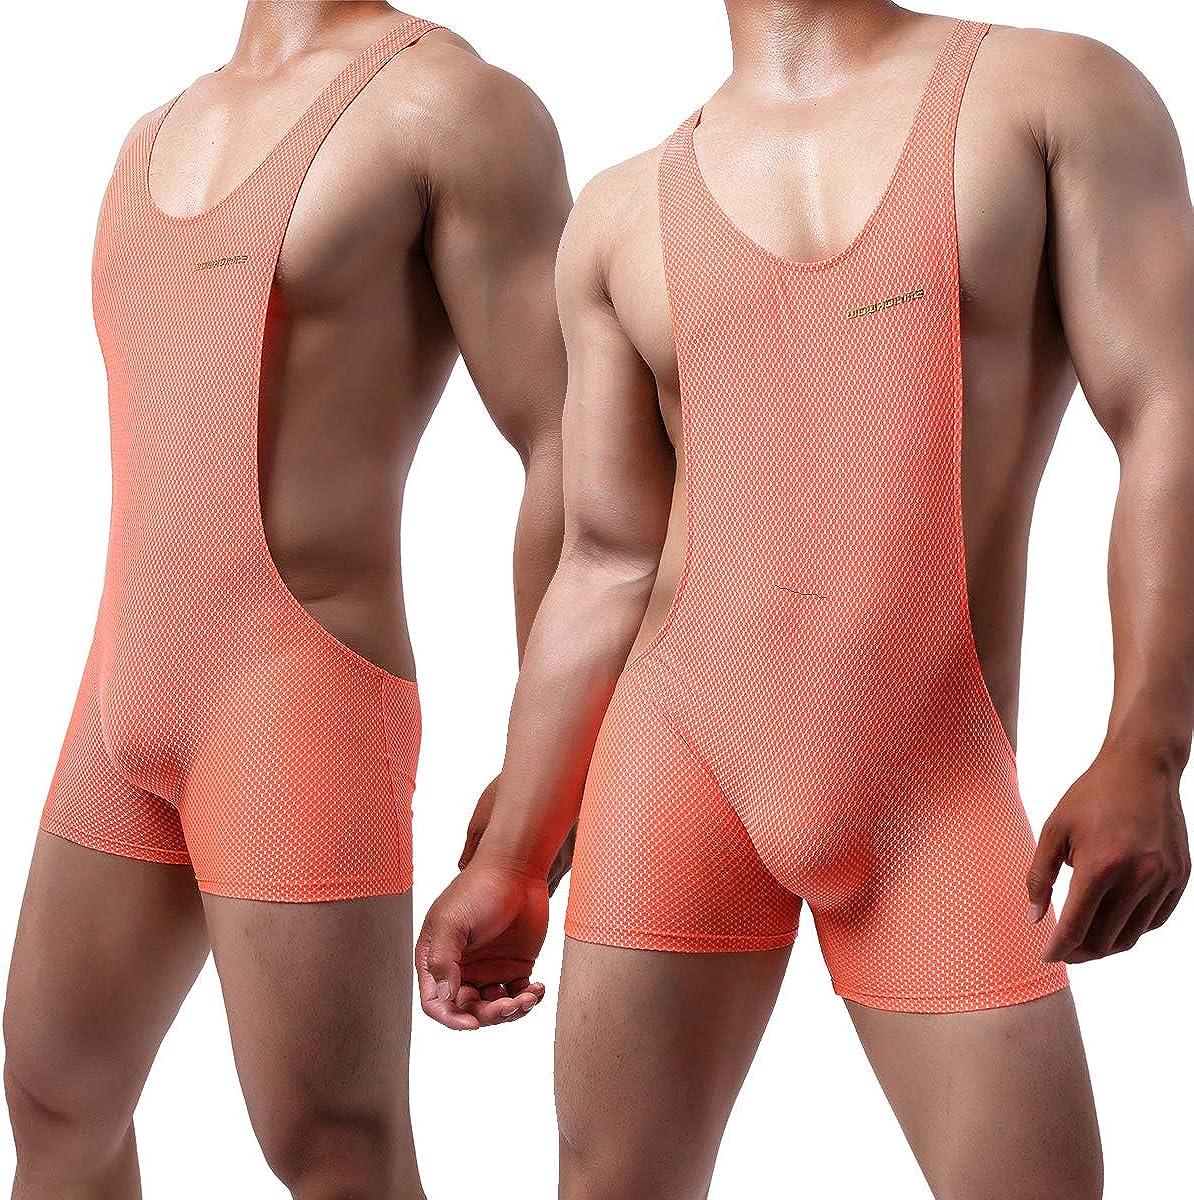 YUFEIDA Mens Athletic Supporters Mesh Breathable Bodysuit Wrestling Leotard Stretchy Base Layers Boxer Singlet